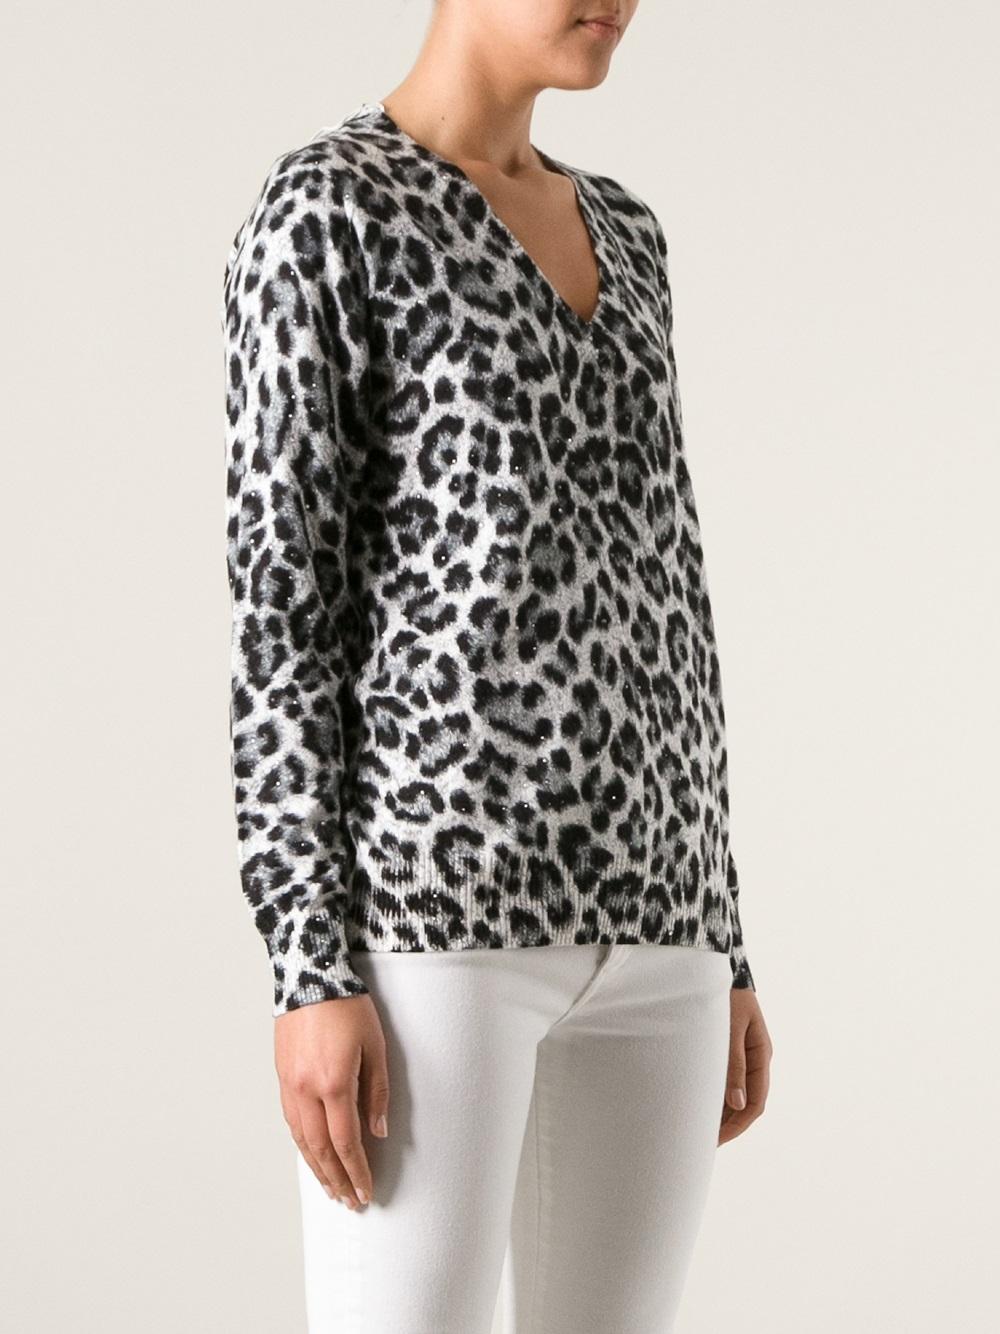 Michael Michael Kors Leopard Print Sweater In Black Lyst